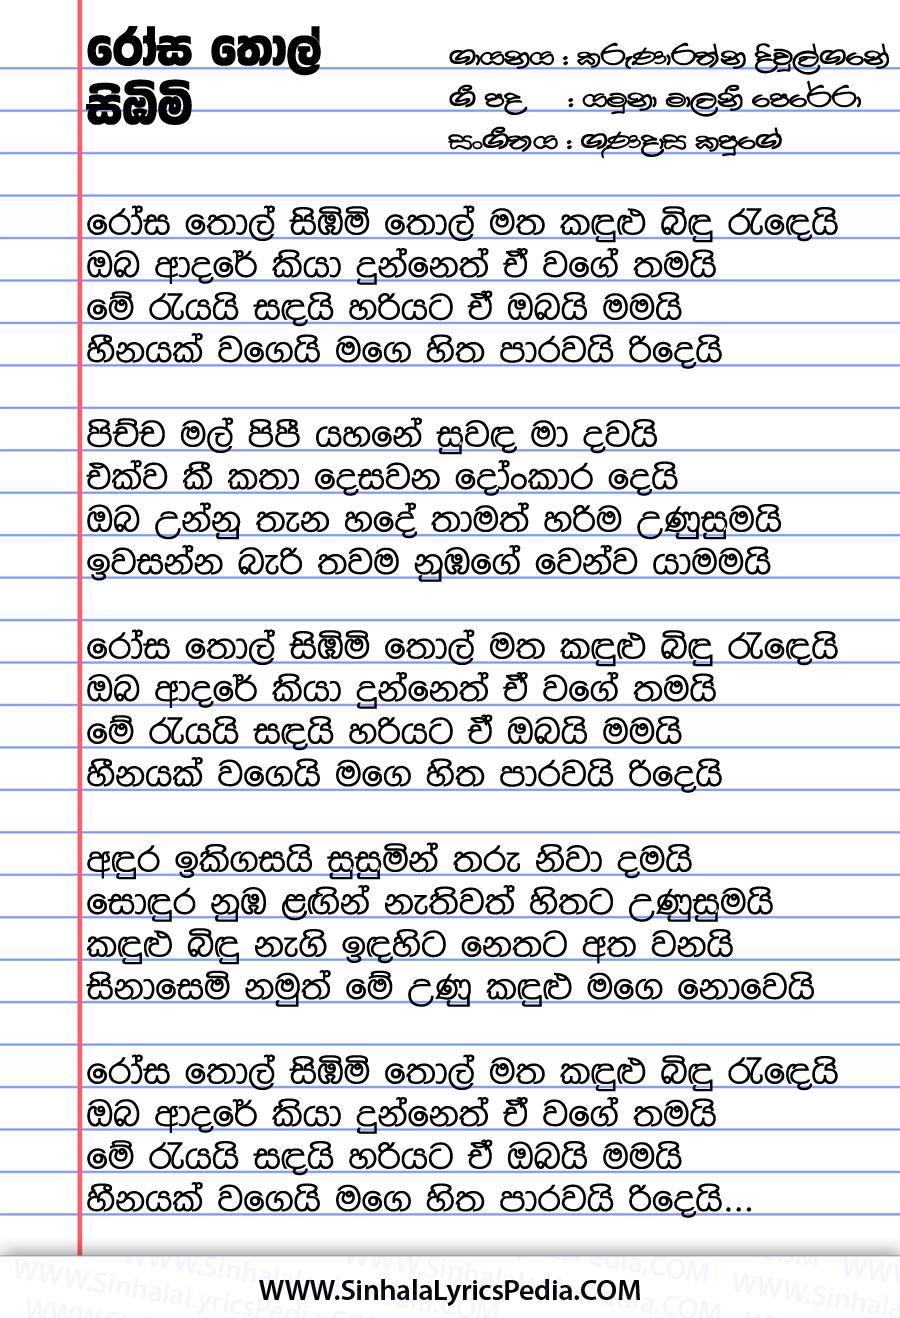 Rosa Thol Sibim Thol Matha Kadulu Bidu Radei Song Lyrics